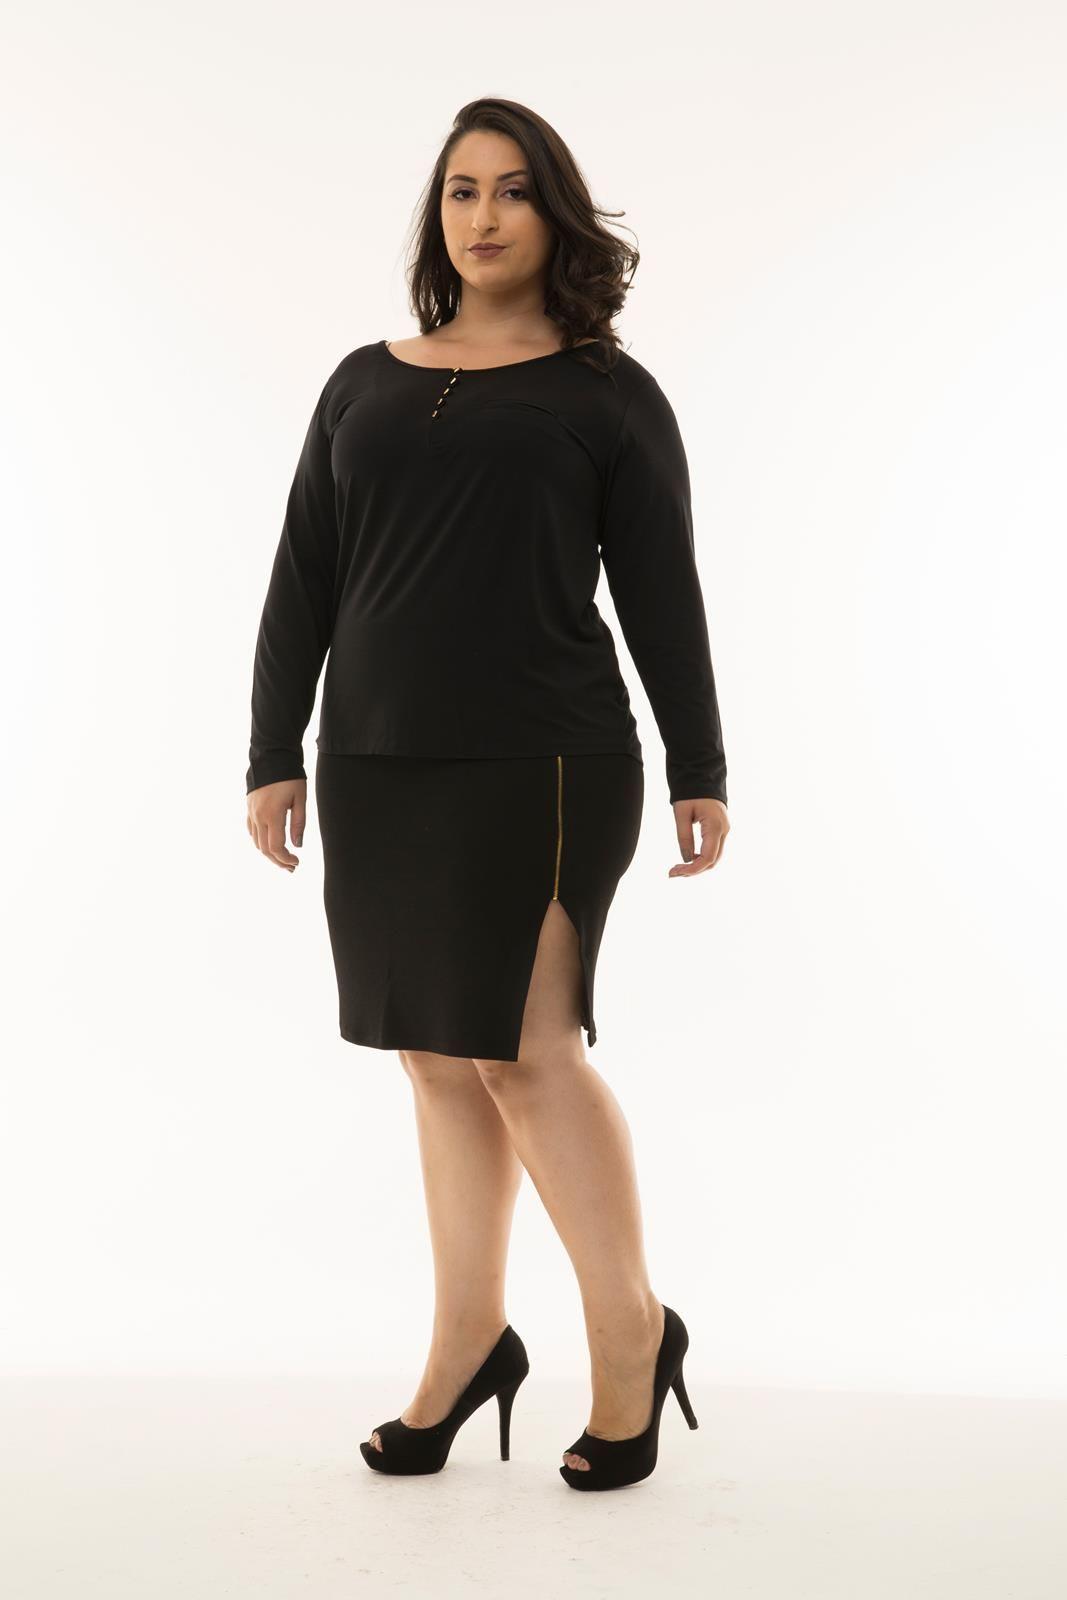 Blusa Plus Size com abotoamento